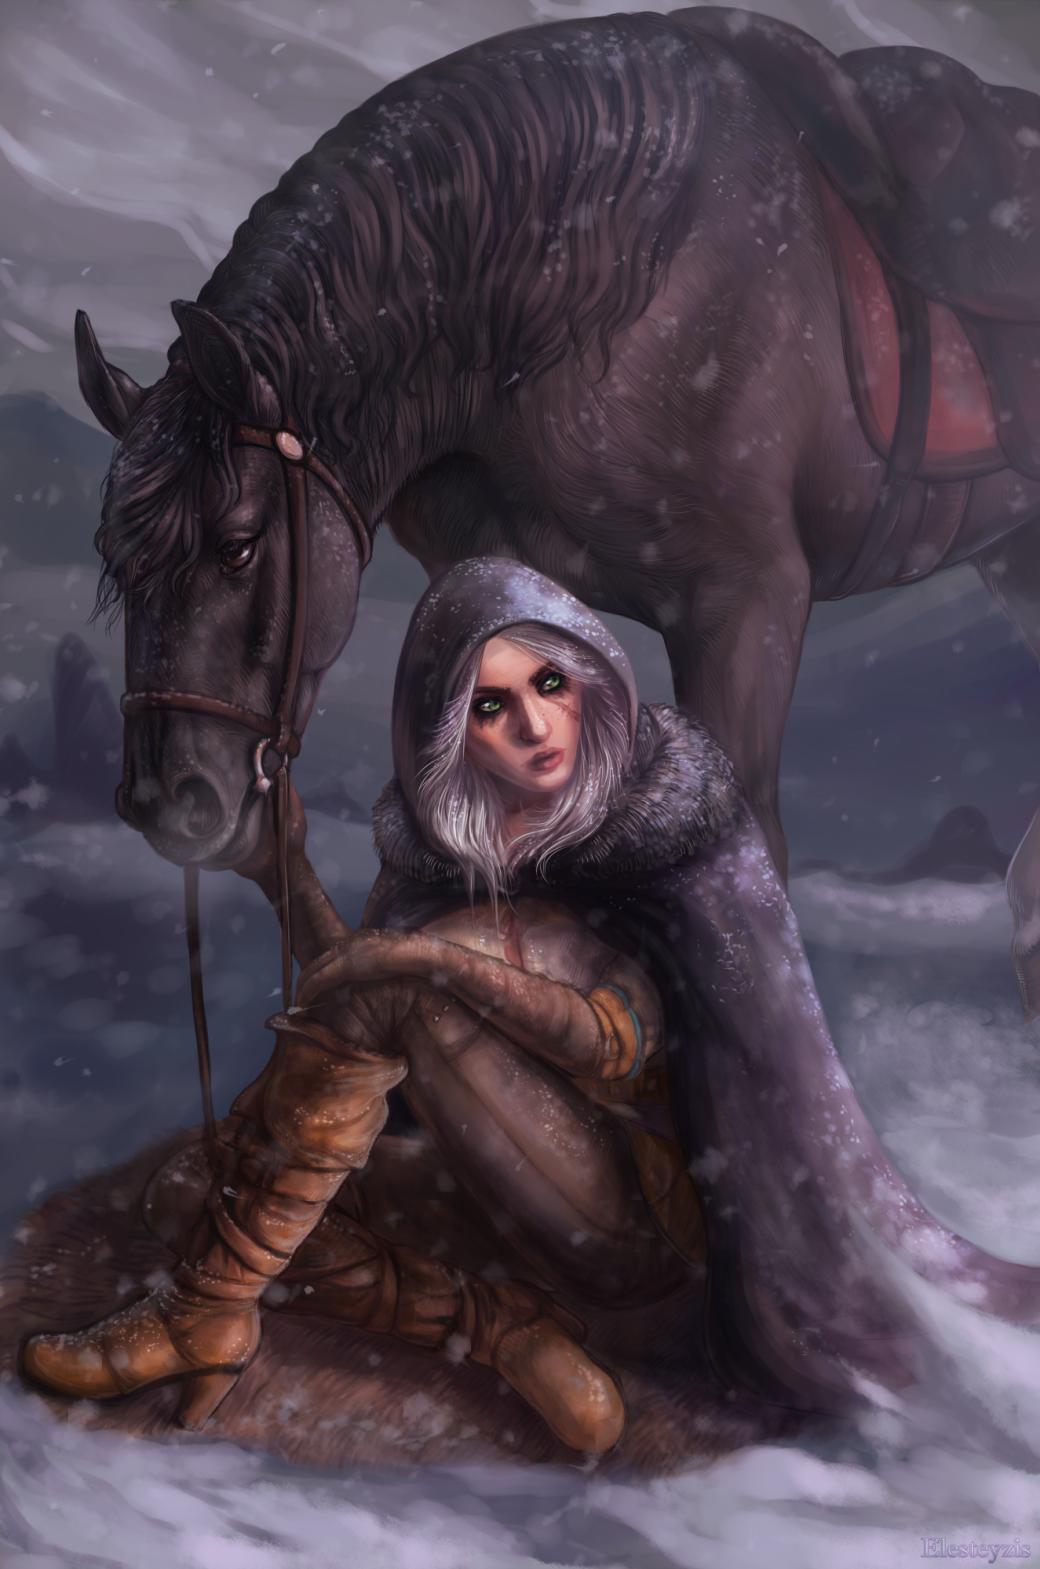 Превью The Witcher 3: Wild Hunt - Изображение 3